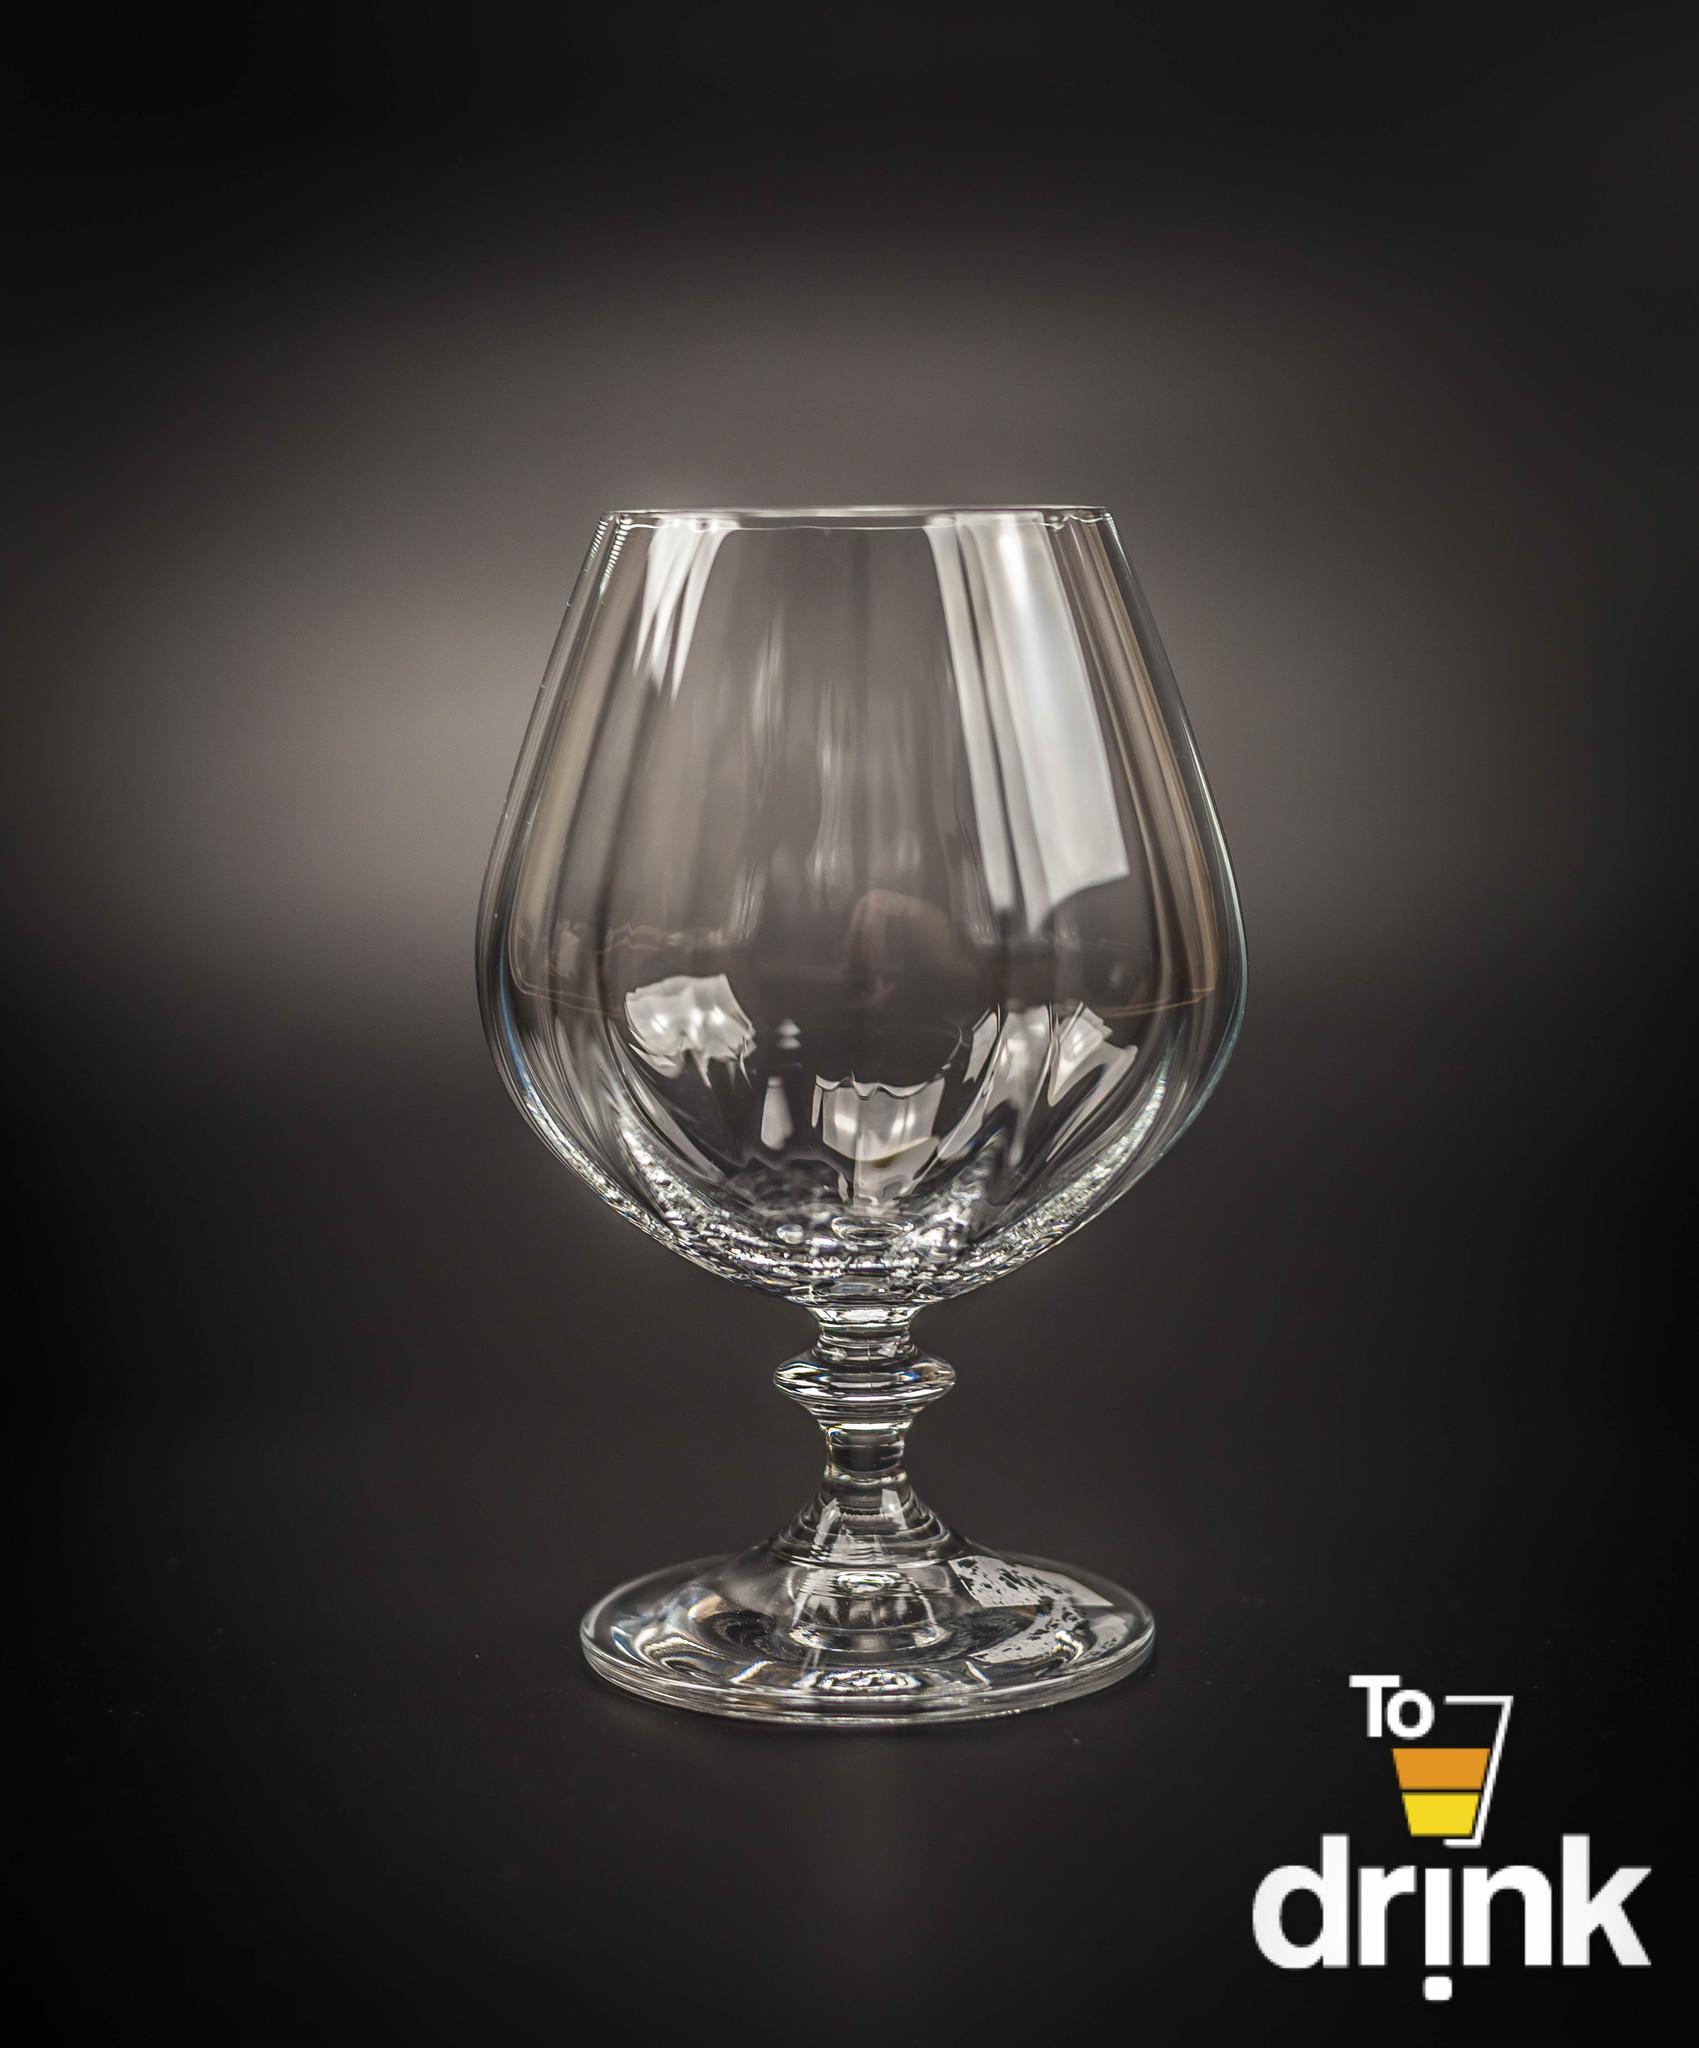 Набор из 6 бокалов для бренди, 400 мл набор бокалов для бренди bohemia crystal оливия 400 мл 6 шт